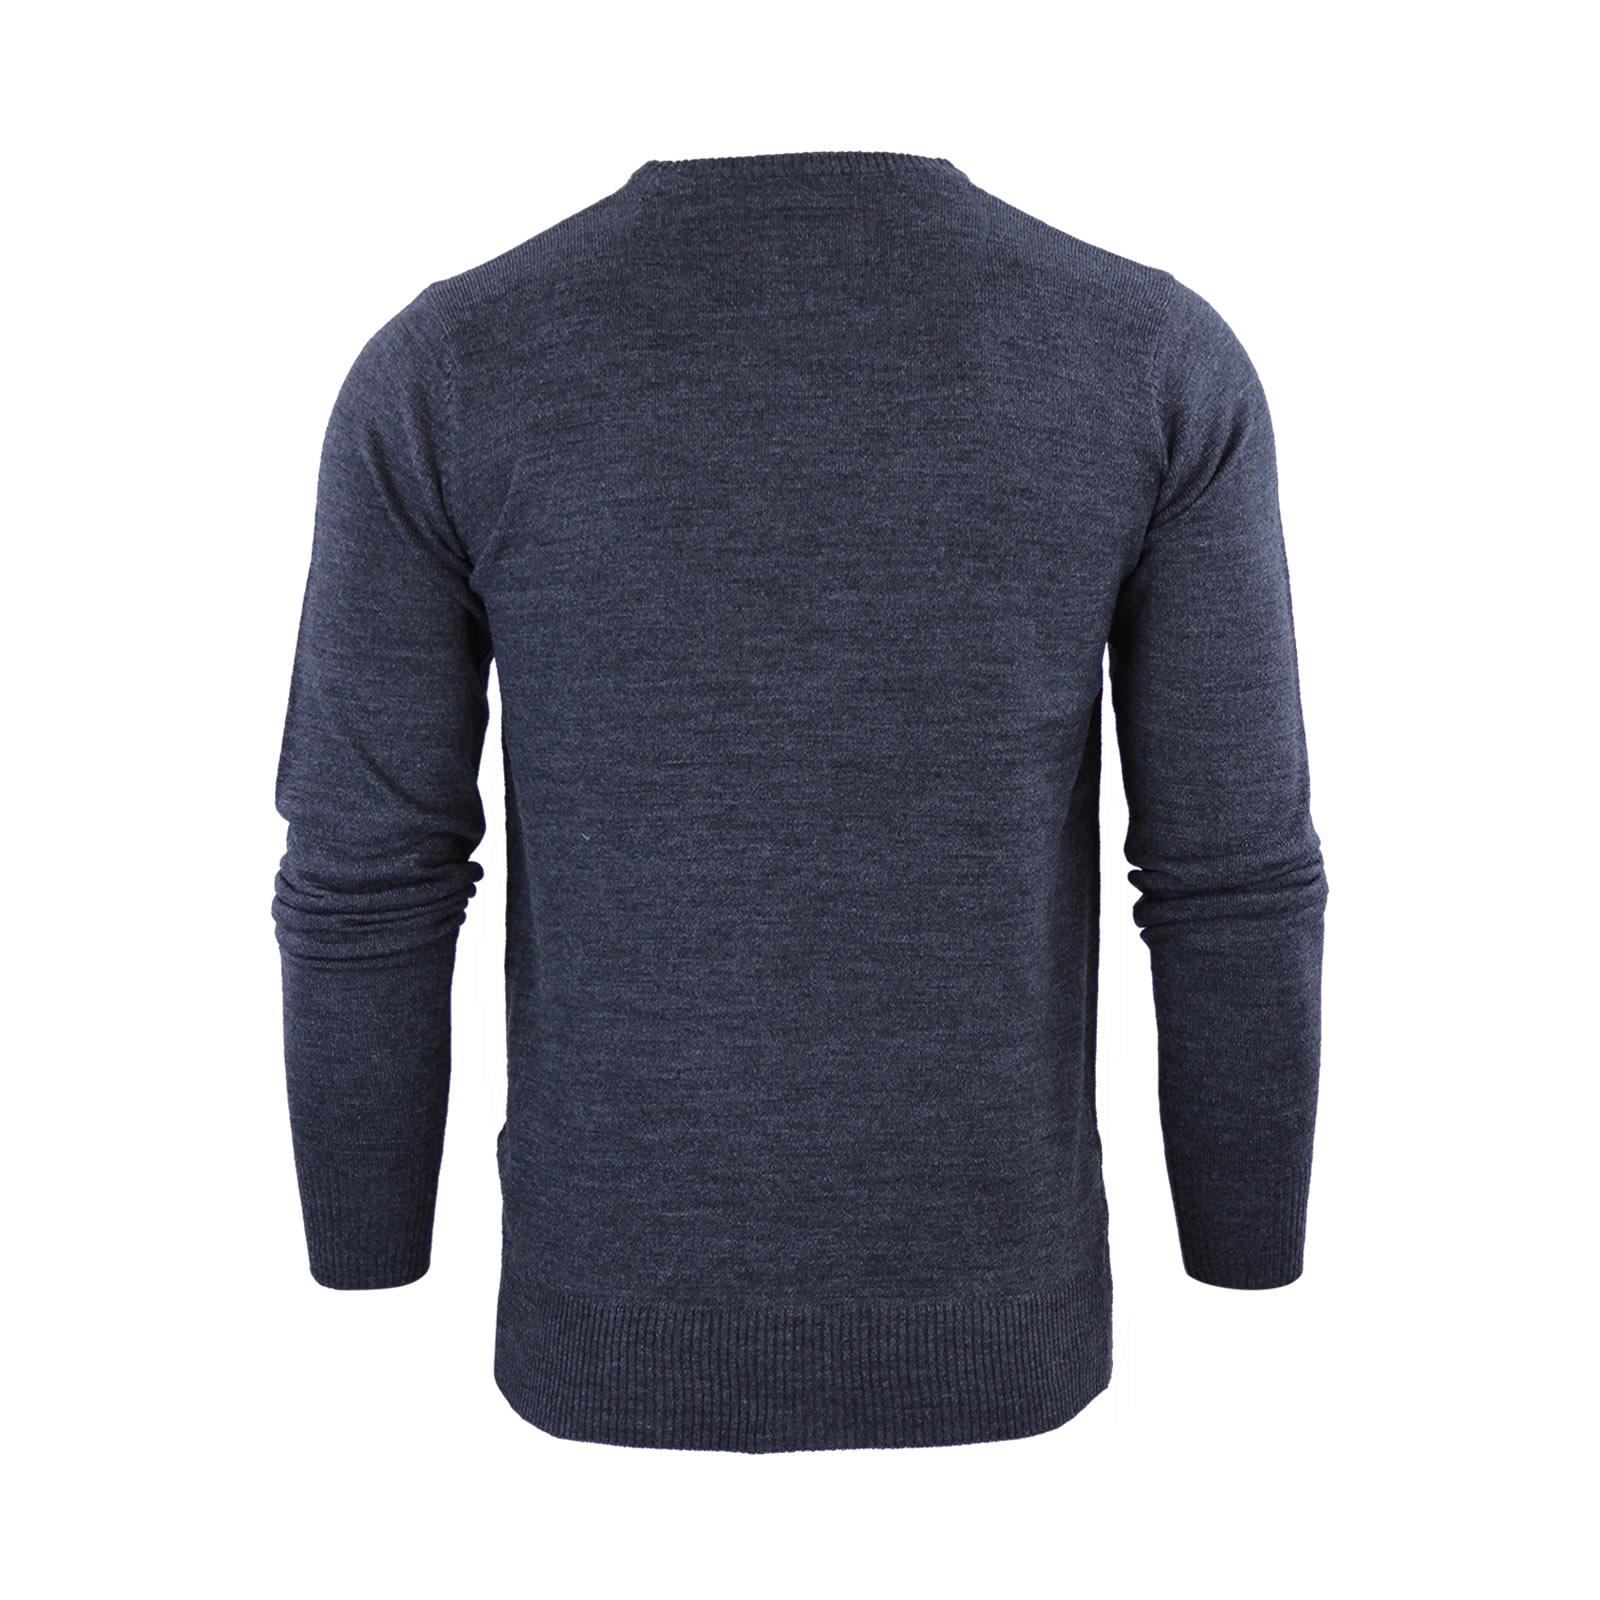 Mens-Jumper-Brave-Soul-Urbain-Knitted-Crew-Neck-Sweater thumbnail 9